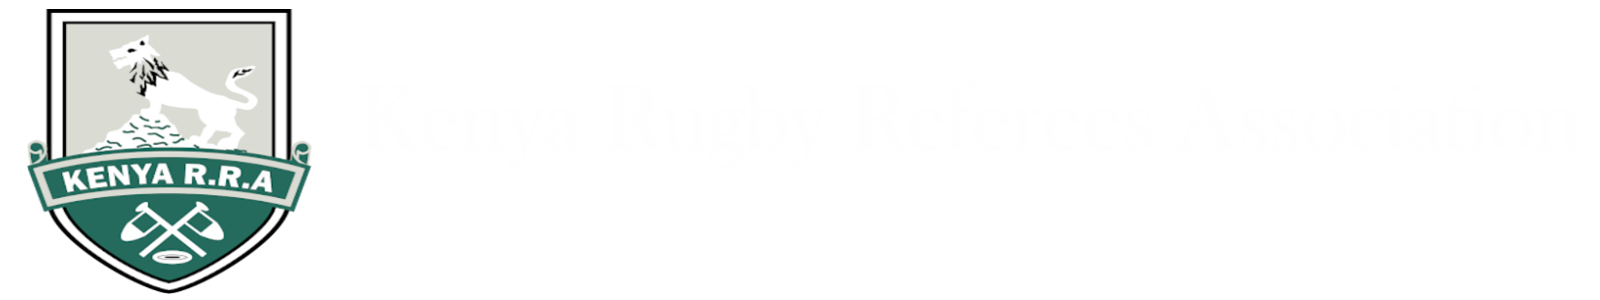 Kenya Rugby Referees Association